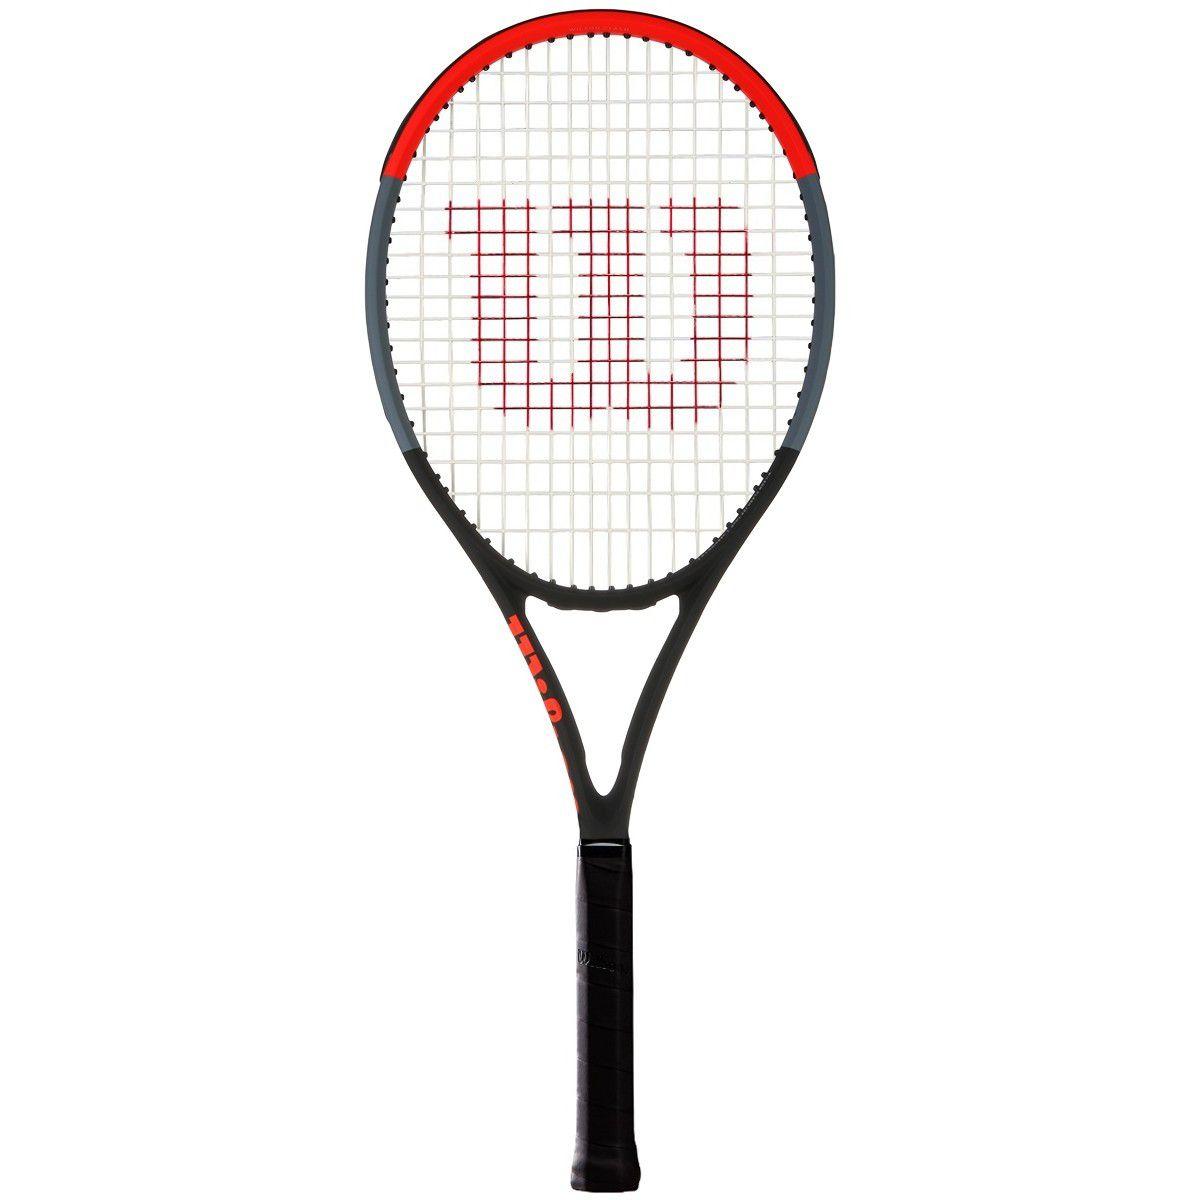 Raquete de Tênis Wilson Clash 100 Tour Lançamento - 2019